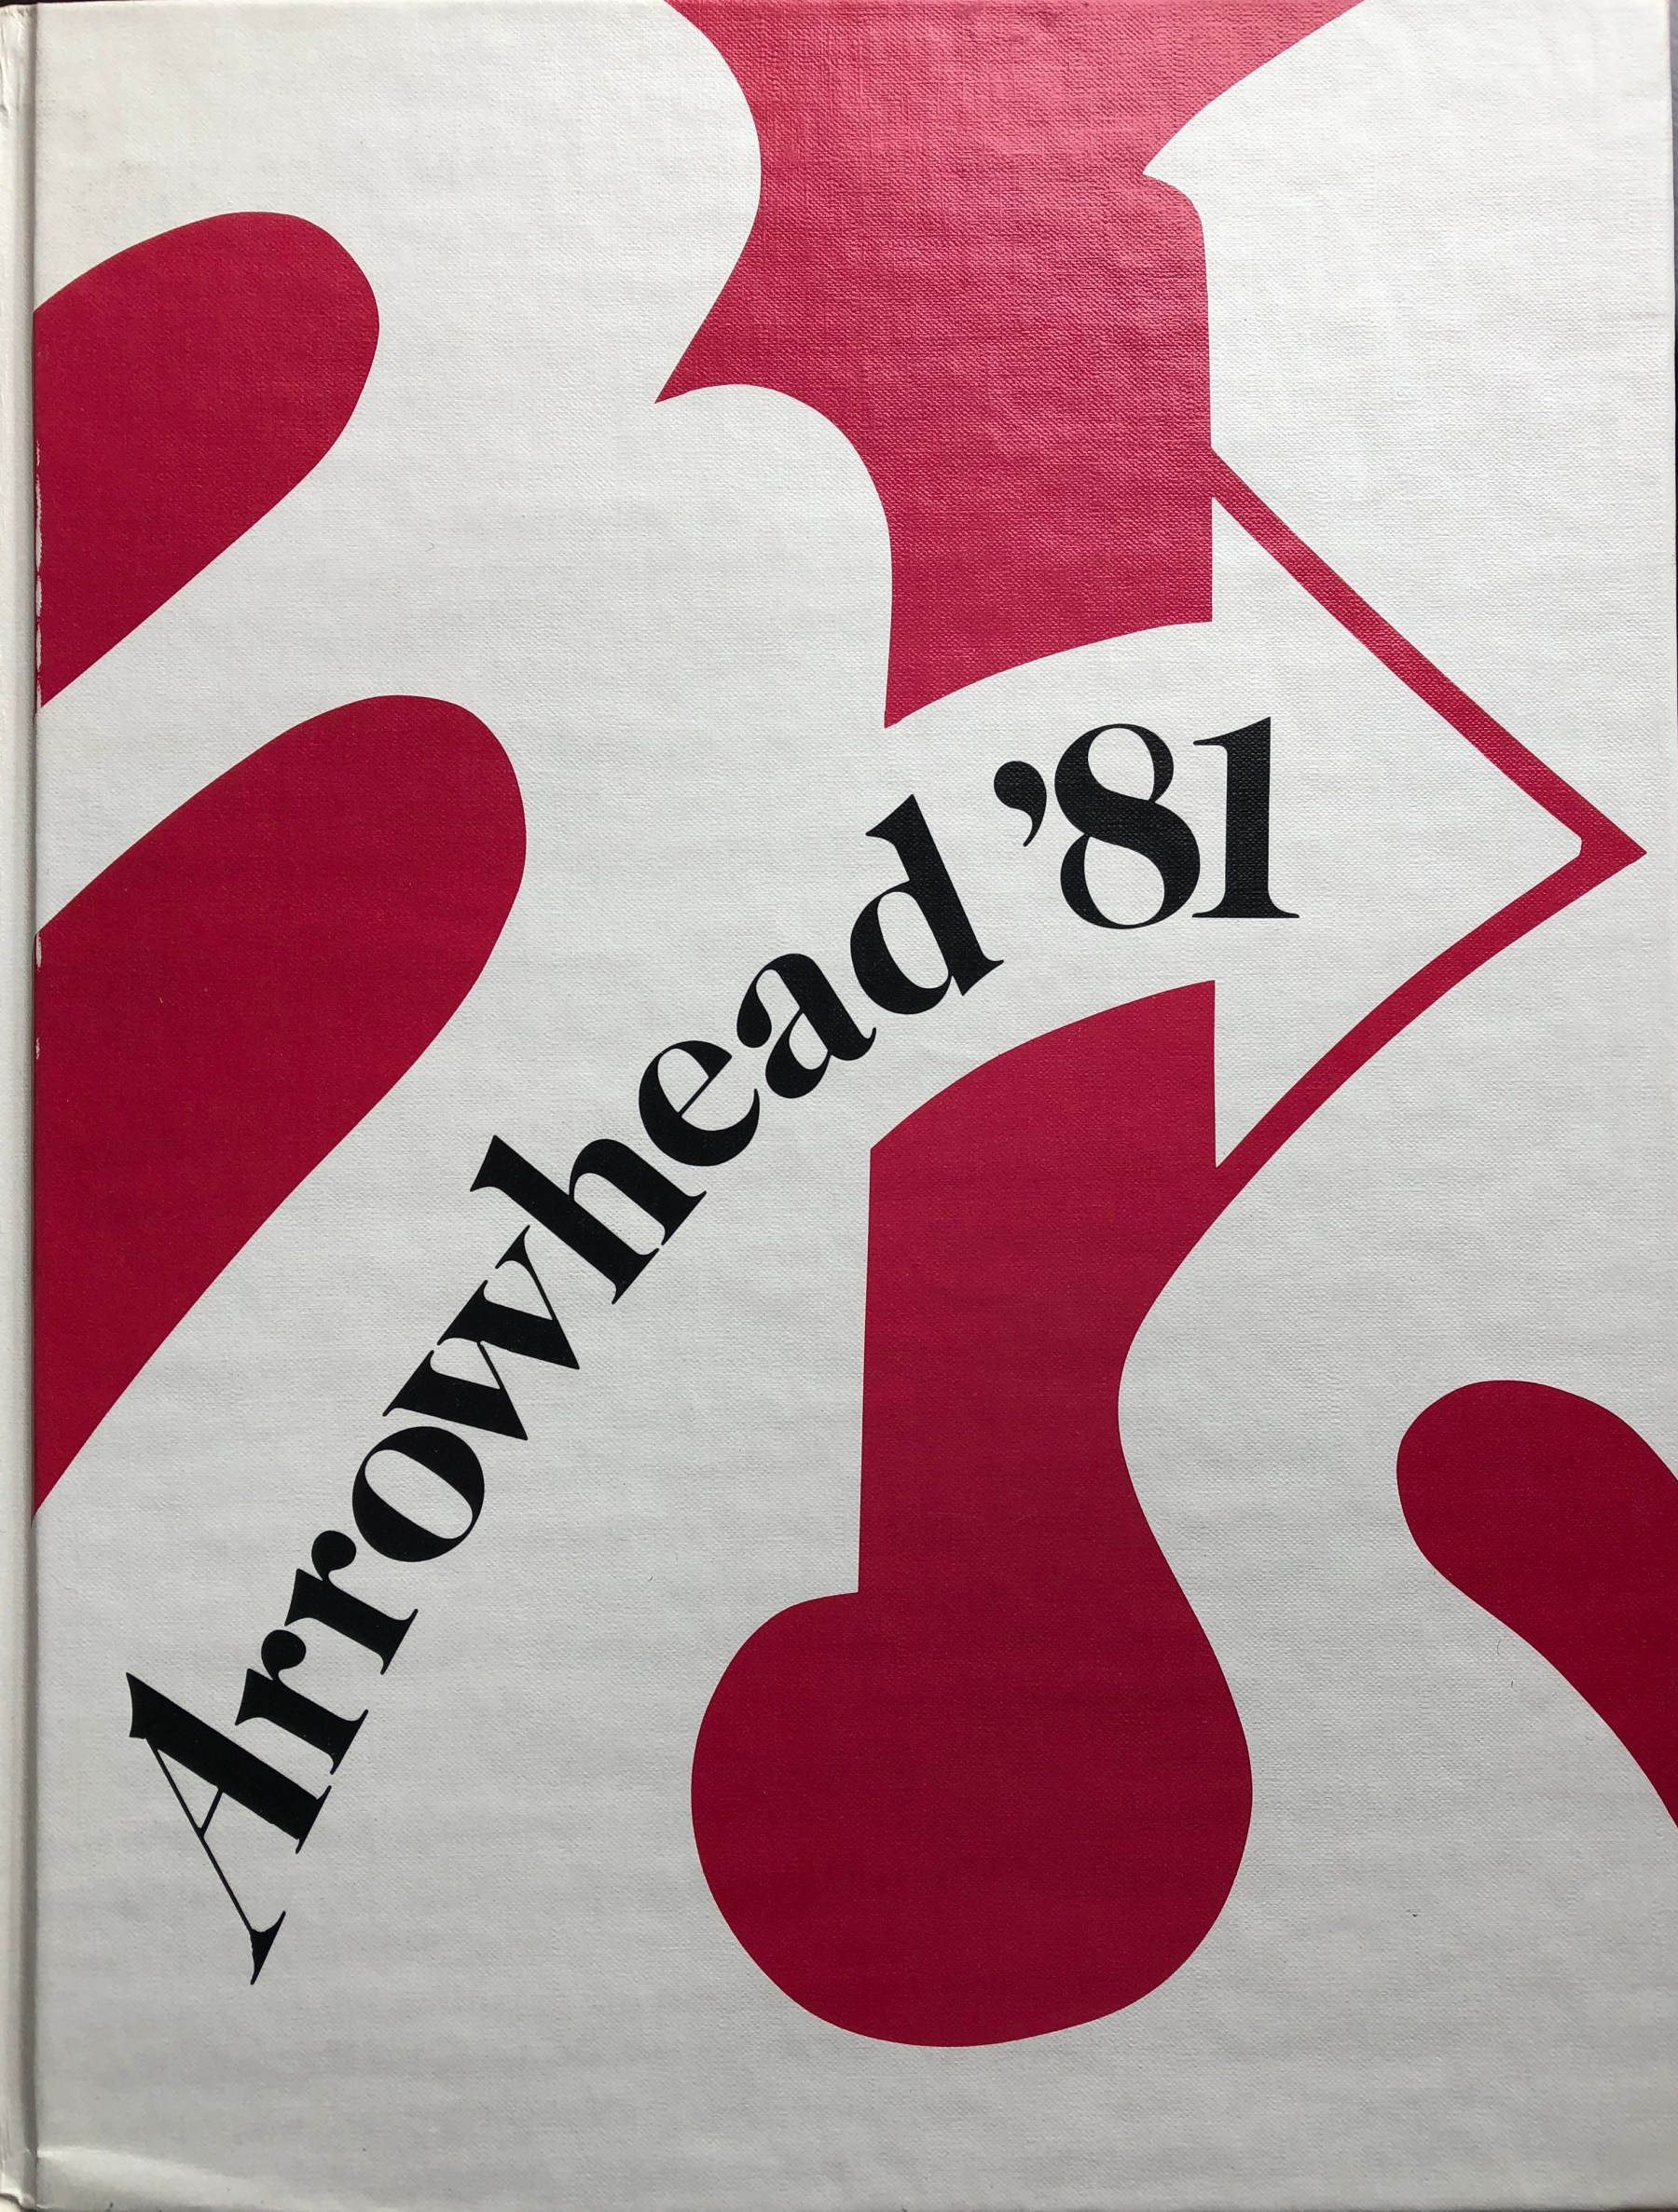 1981 Burlington High School yearbook, Burlington MA